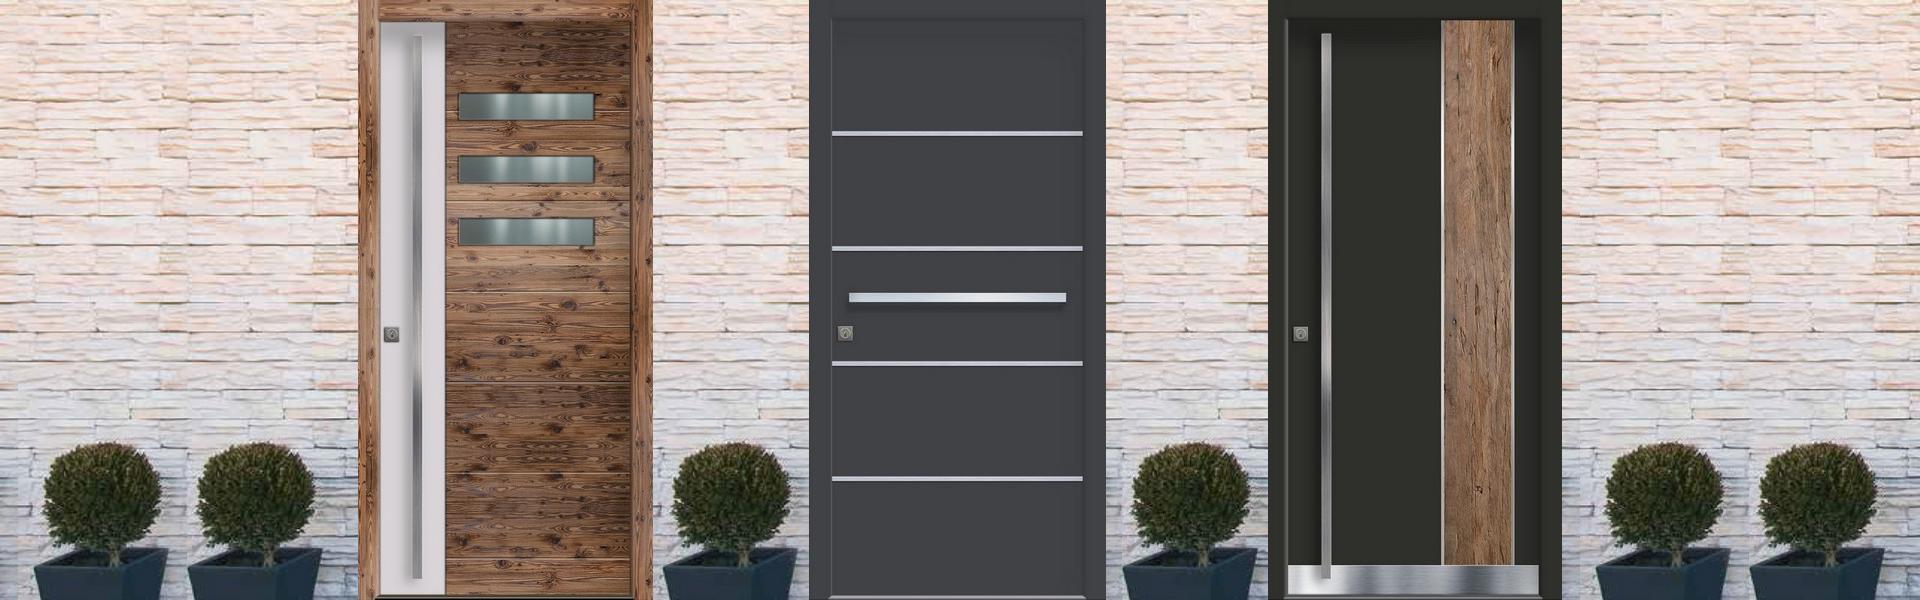 Muralter - Haustüren